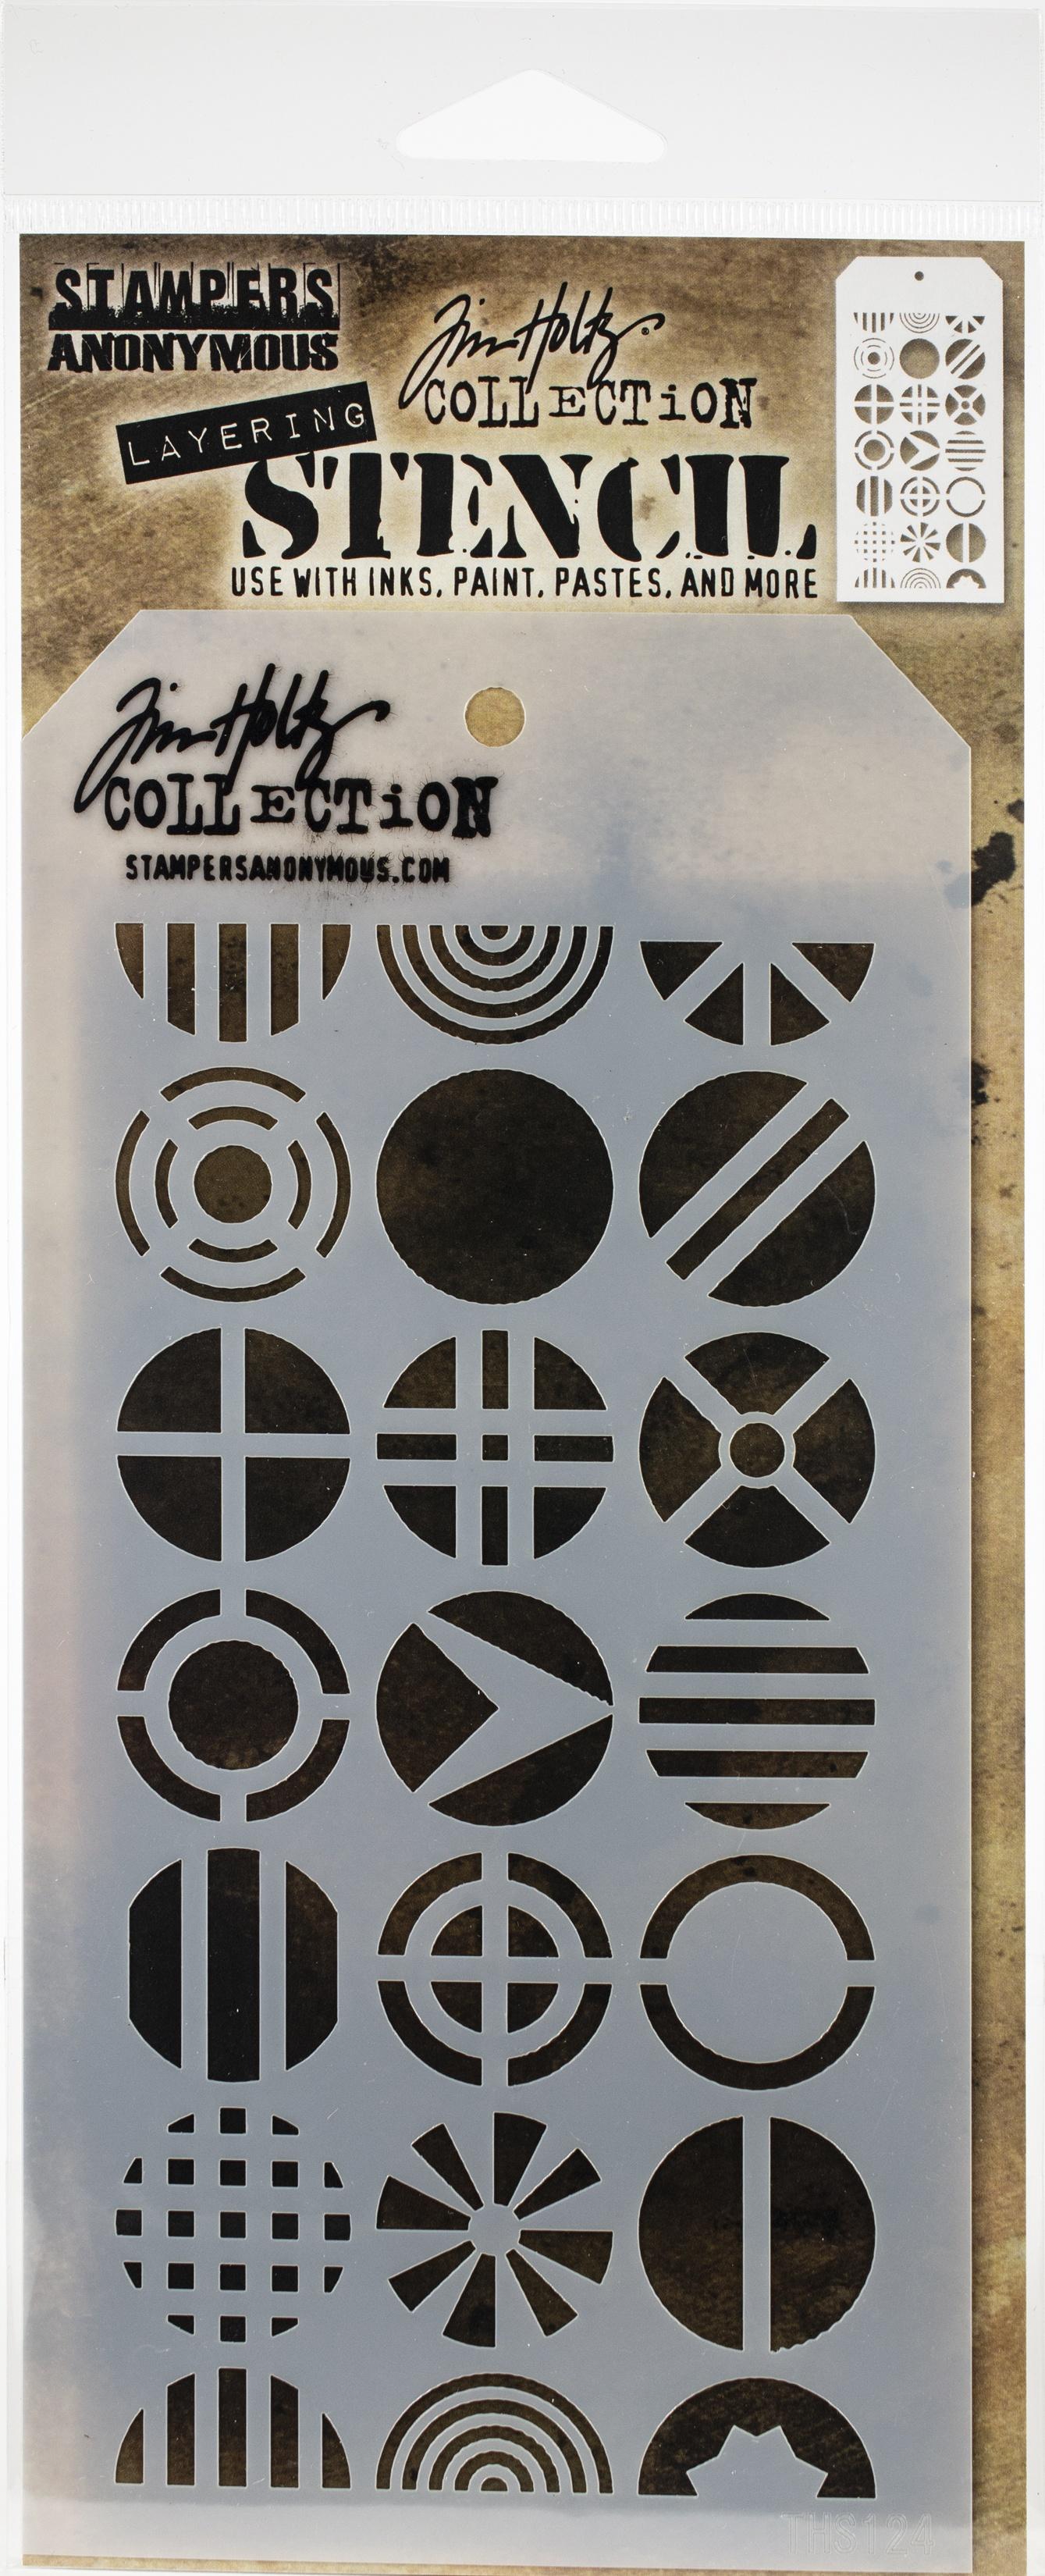 Tim Holtz Layered Stencil 4.125X8.5-Patchwork Circle